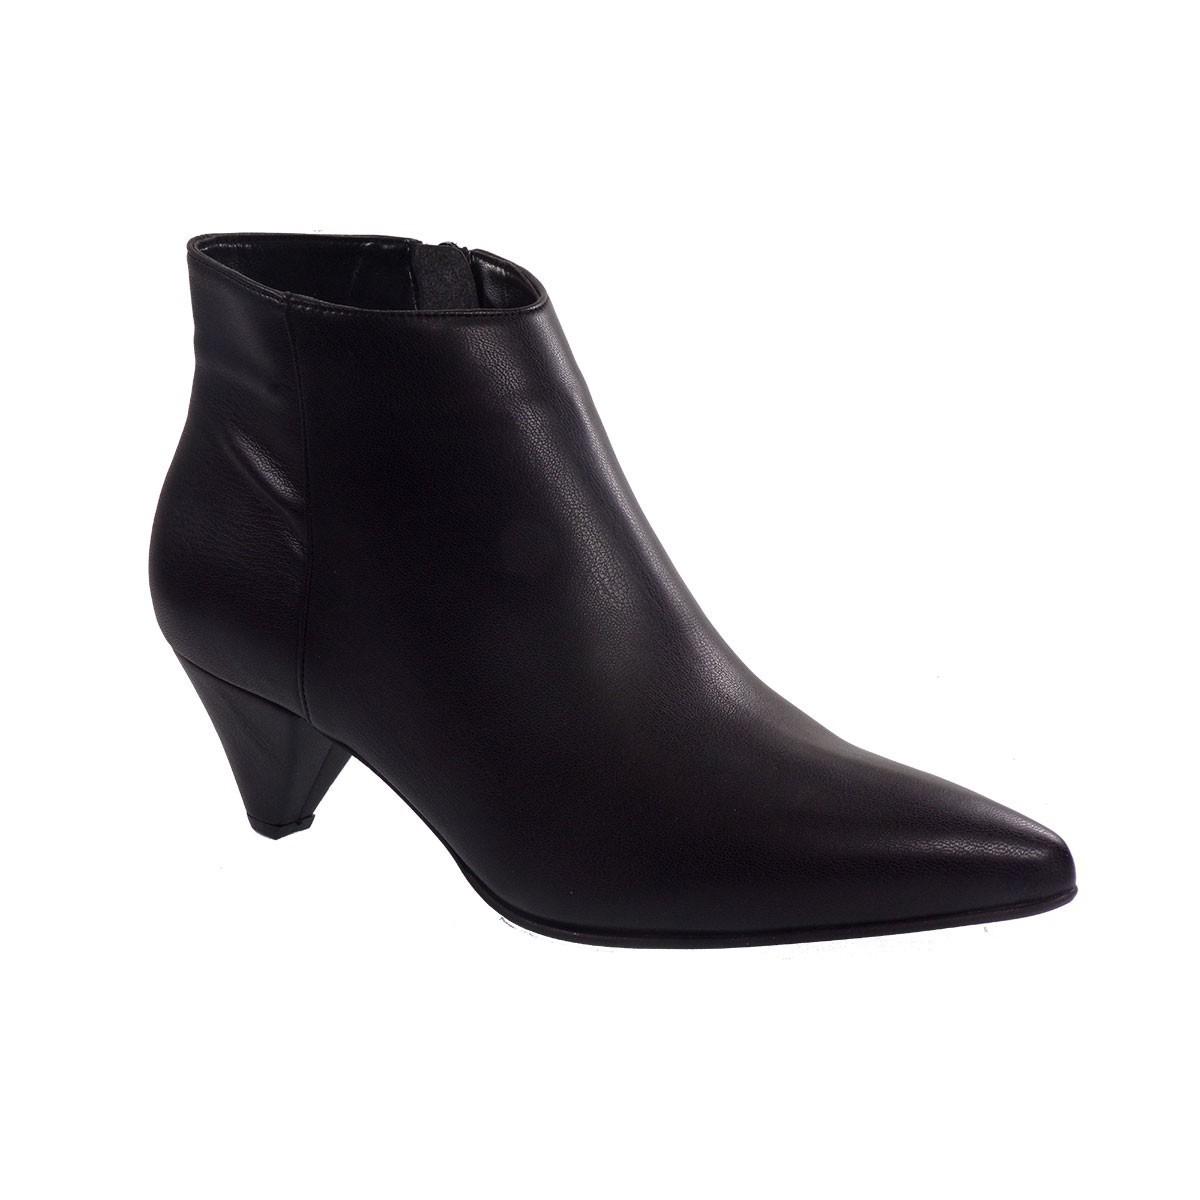 Fardoulis Shoes Γυναικεία Παπούτσια Μποτάκια Αστραγάλου 5609 Μαύρο Δέρμα